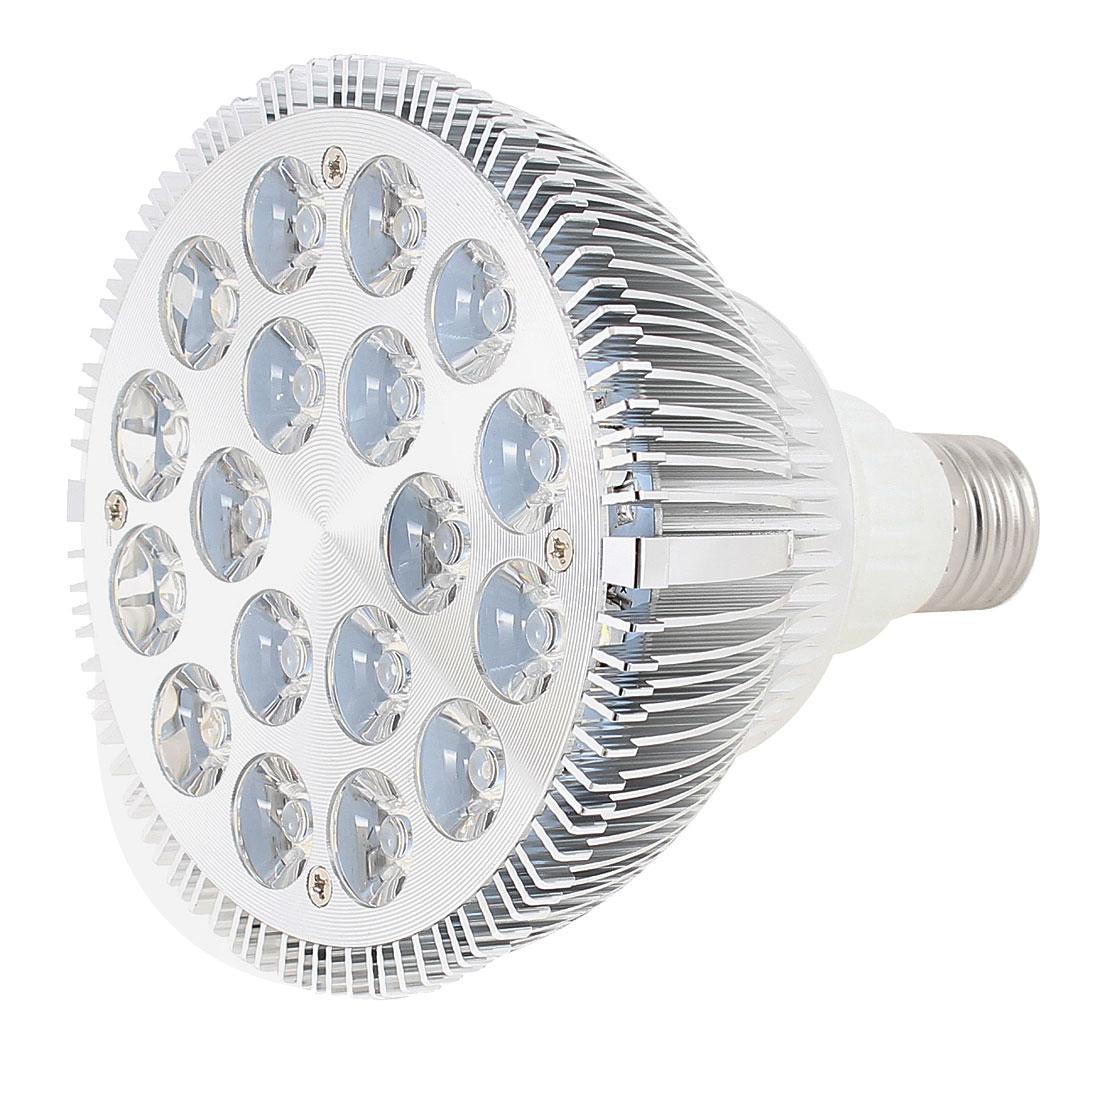 Non-Dimmable 36W E27 60 Degree Beam Angle Warm White Par38 LED Spotlight AC85-265V